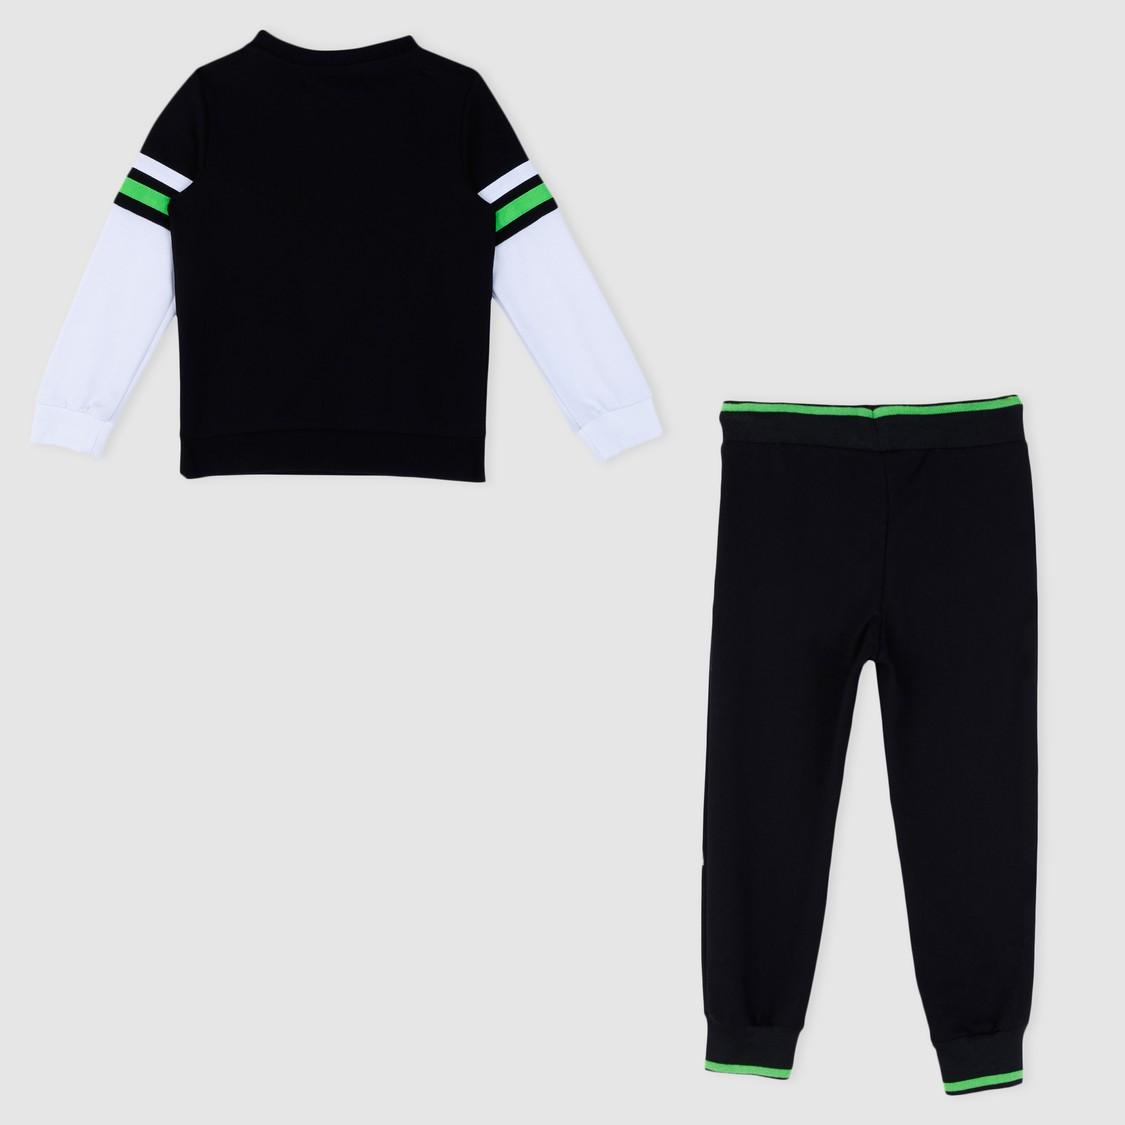 Printed T-Shirt and Jog Pants Set